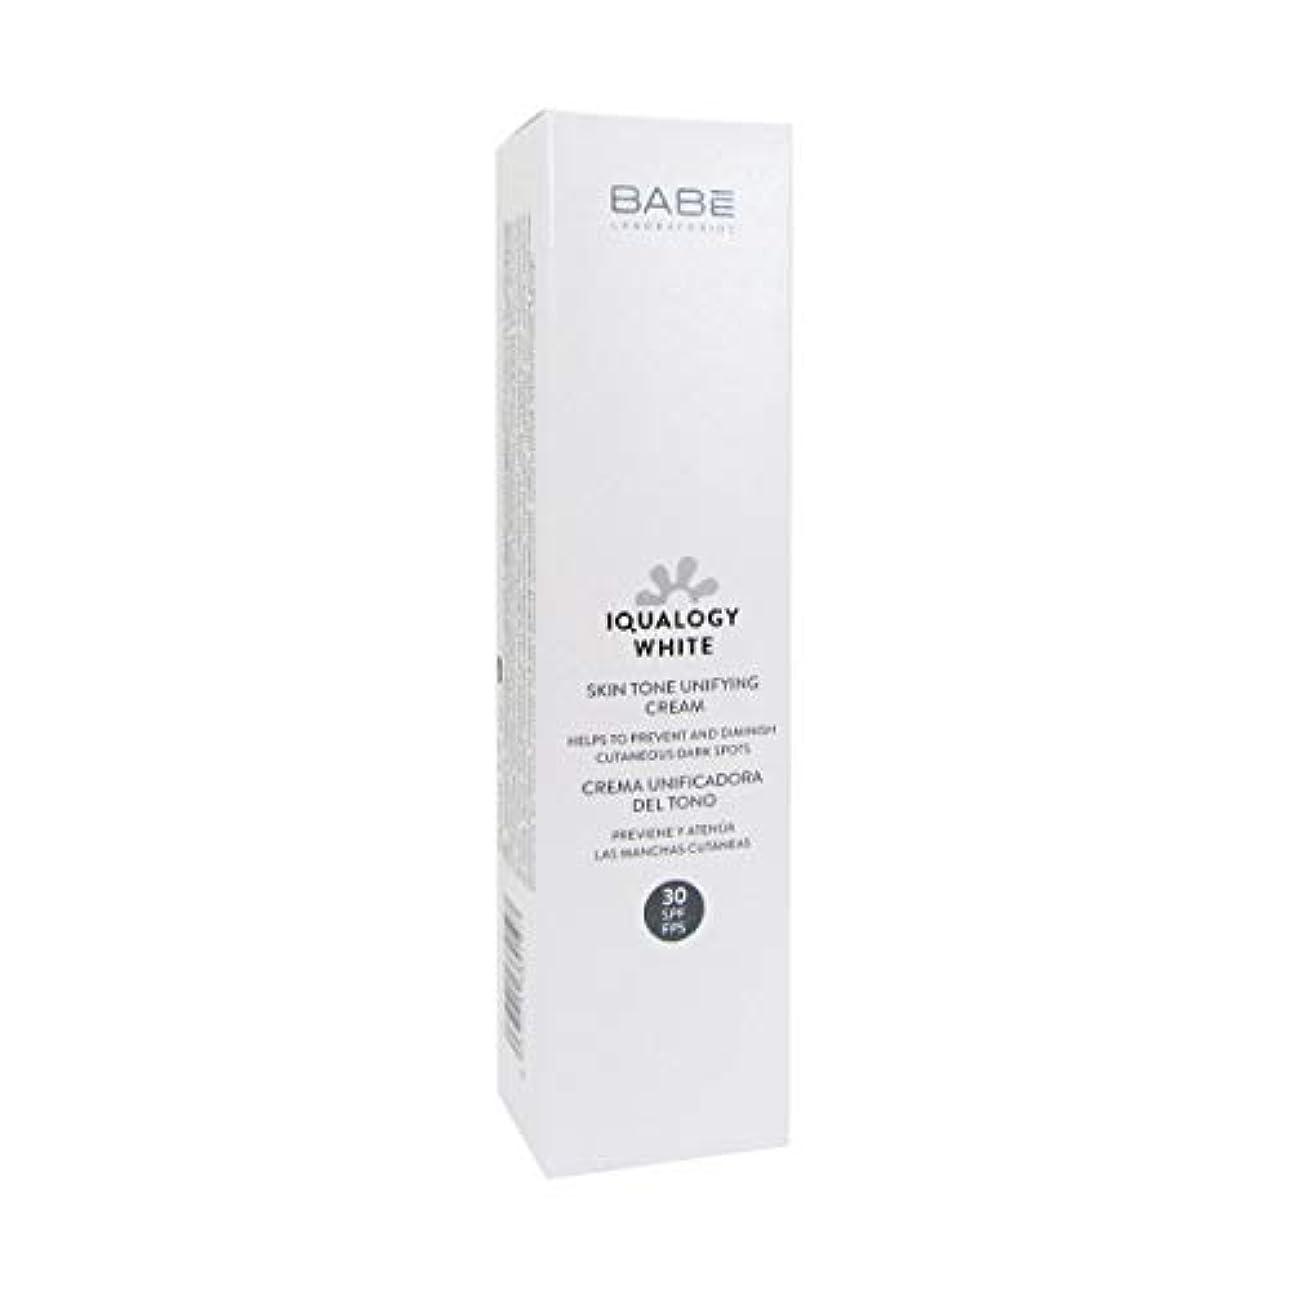 Bab Iqualogy White Cream Spf30 50ml [並行輸入品]